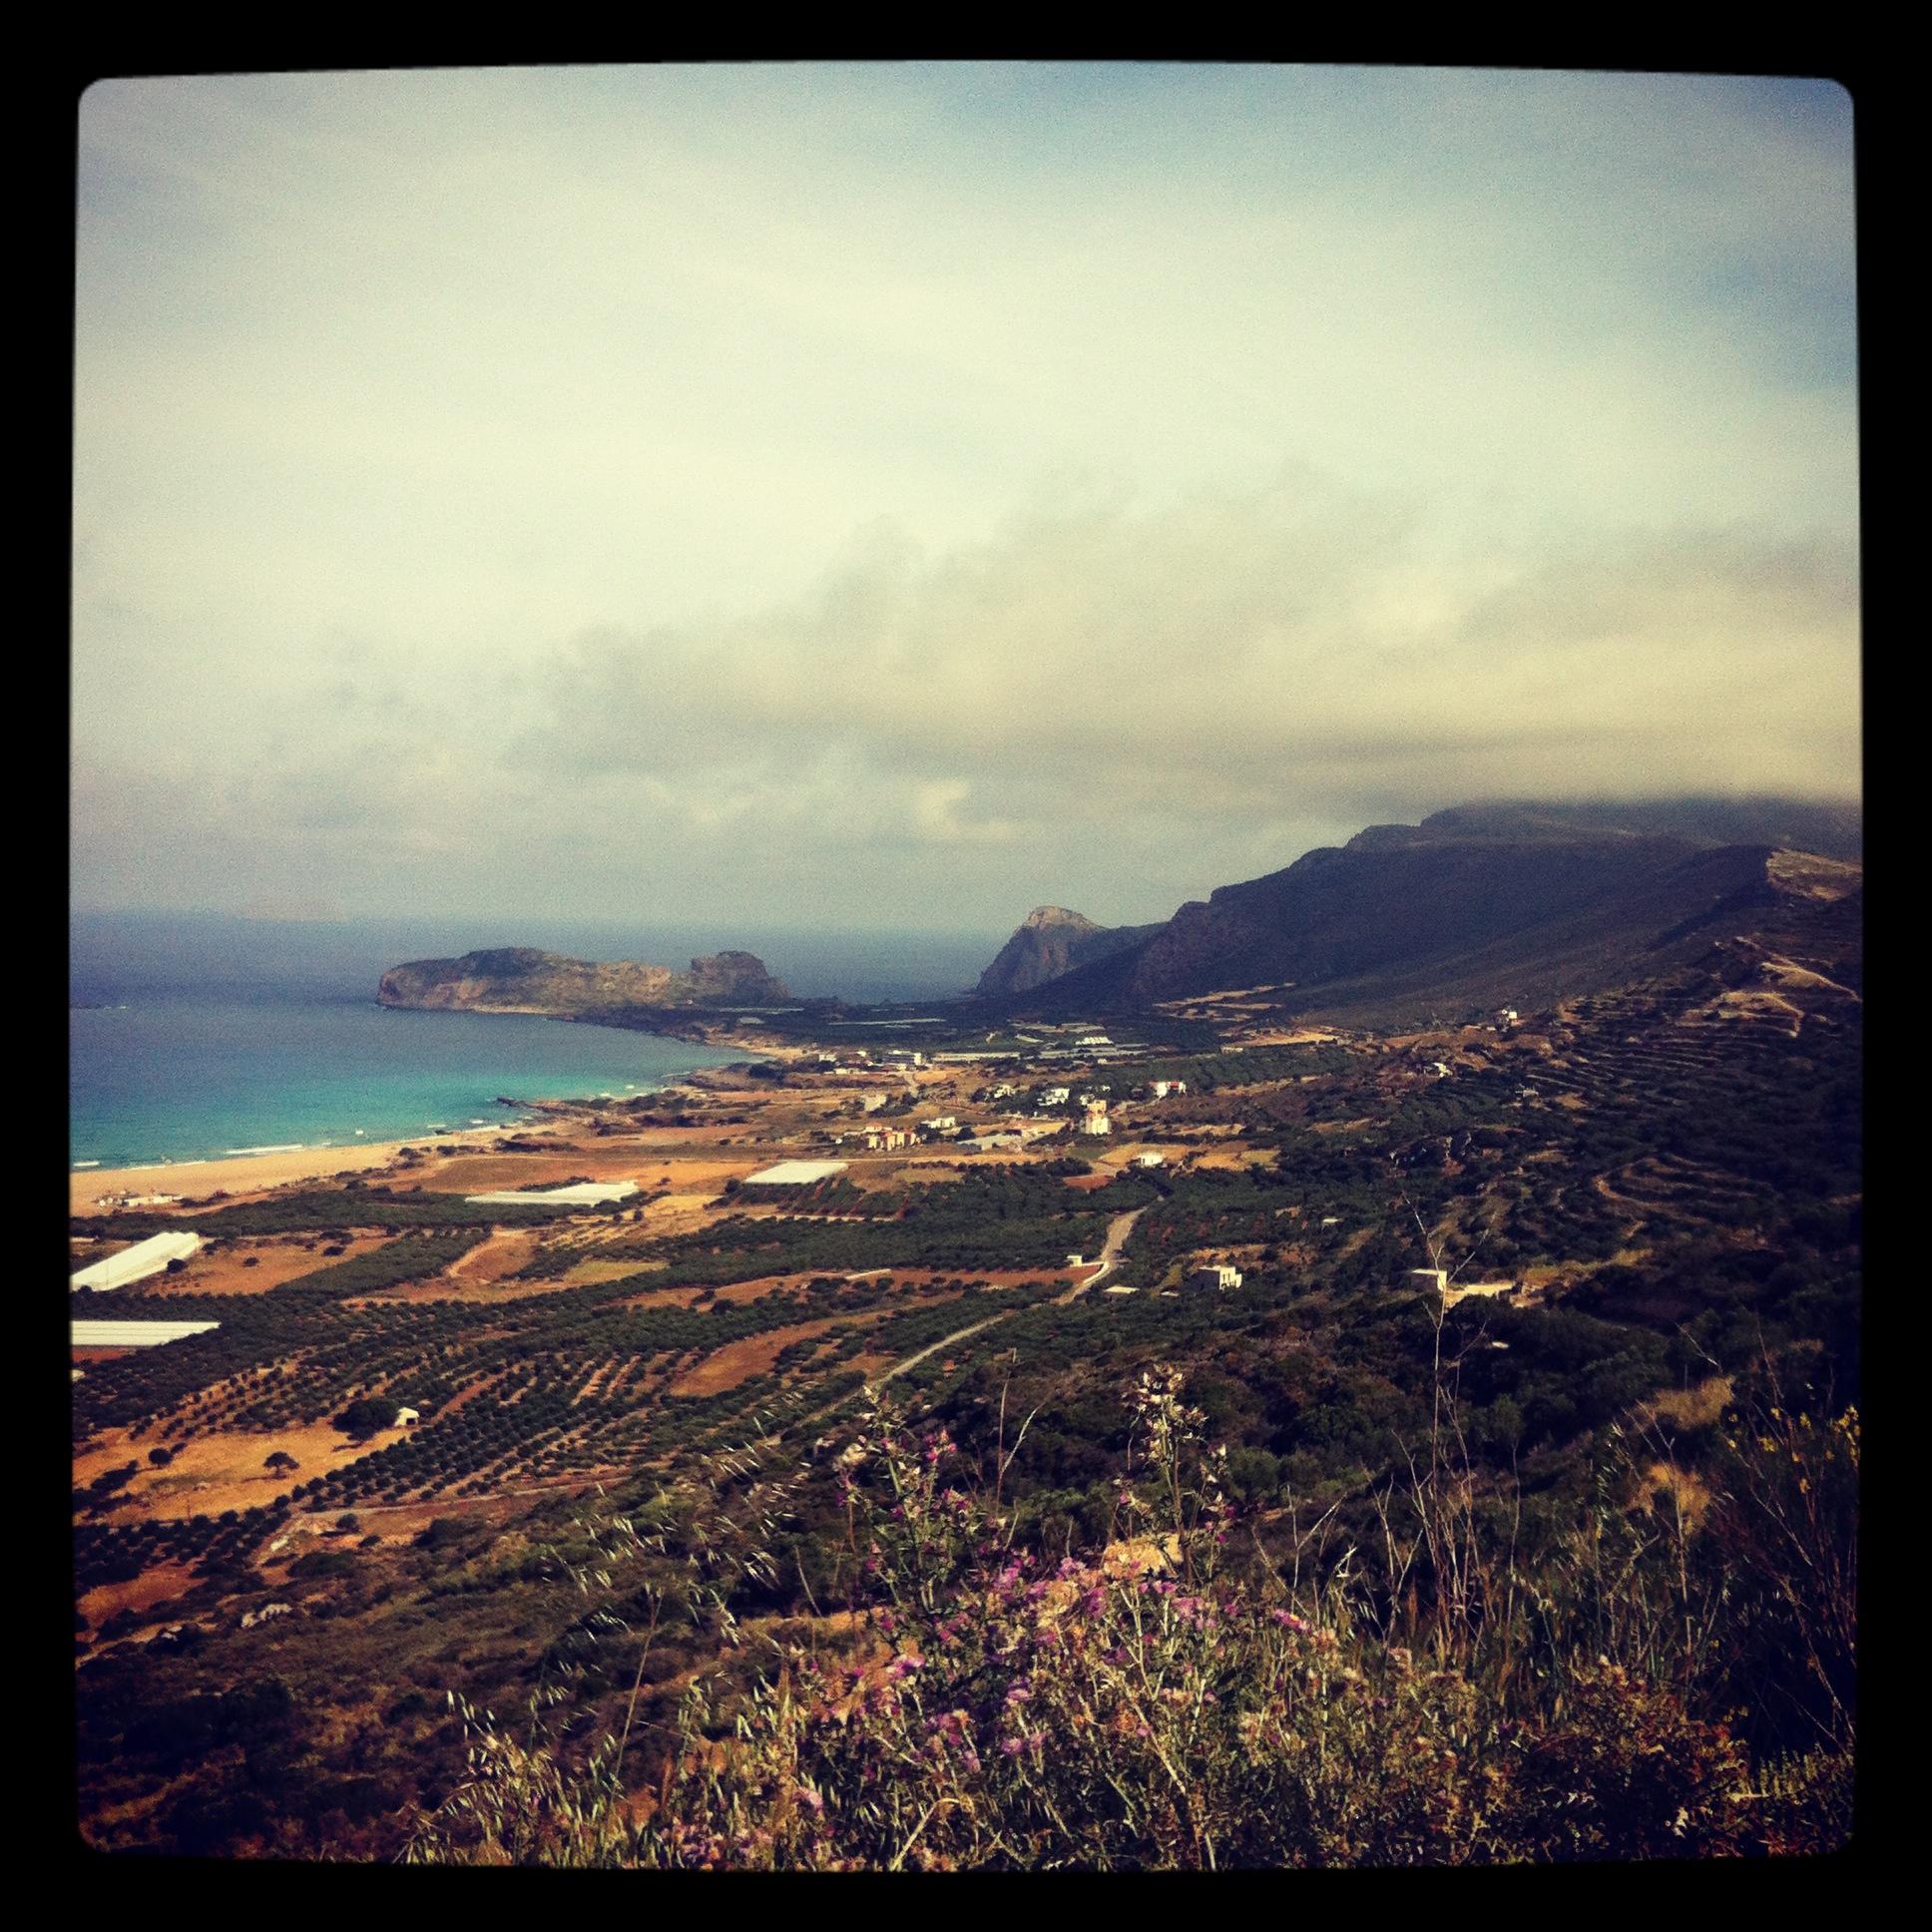 Falassarna, Crete, Greece